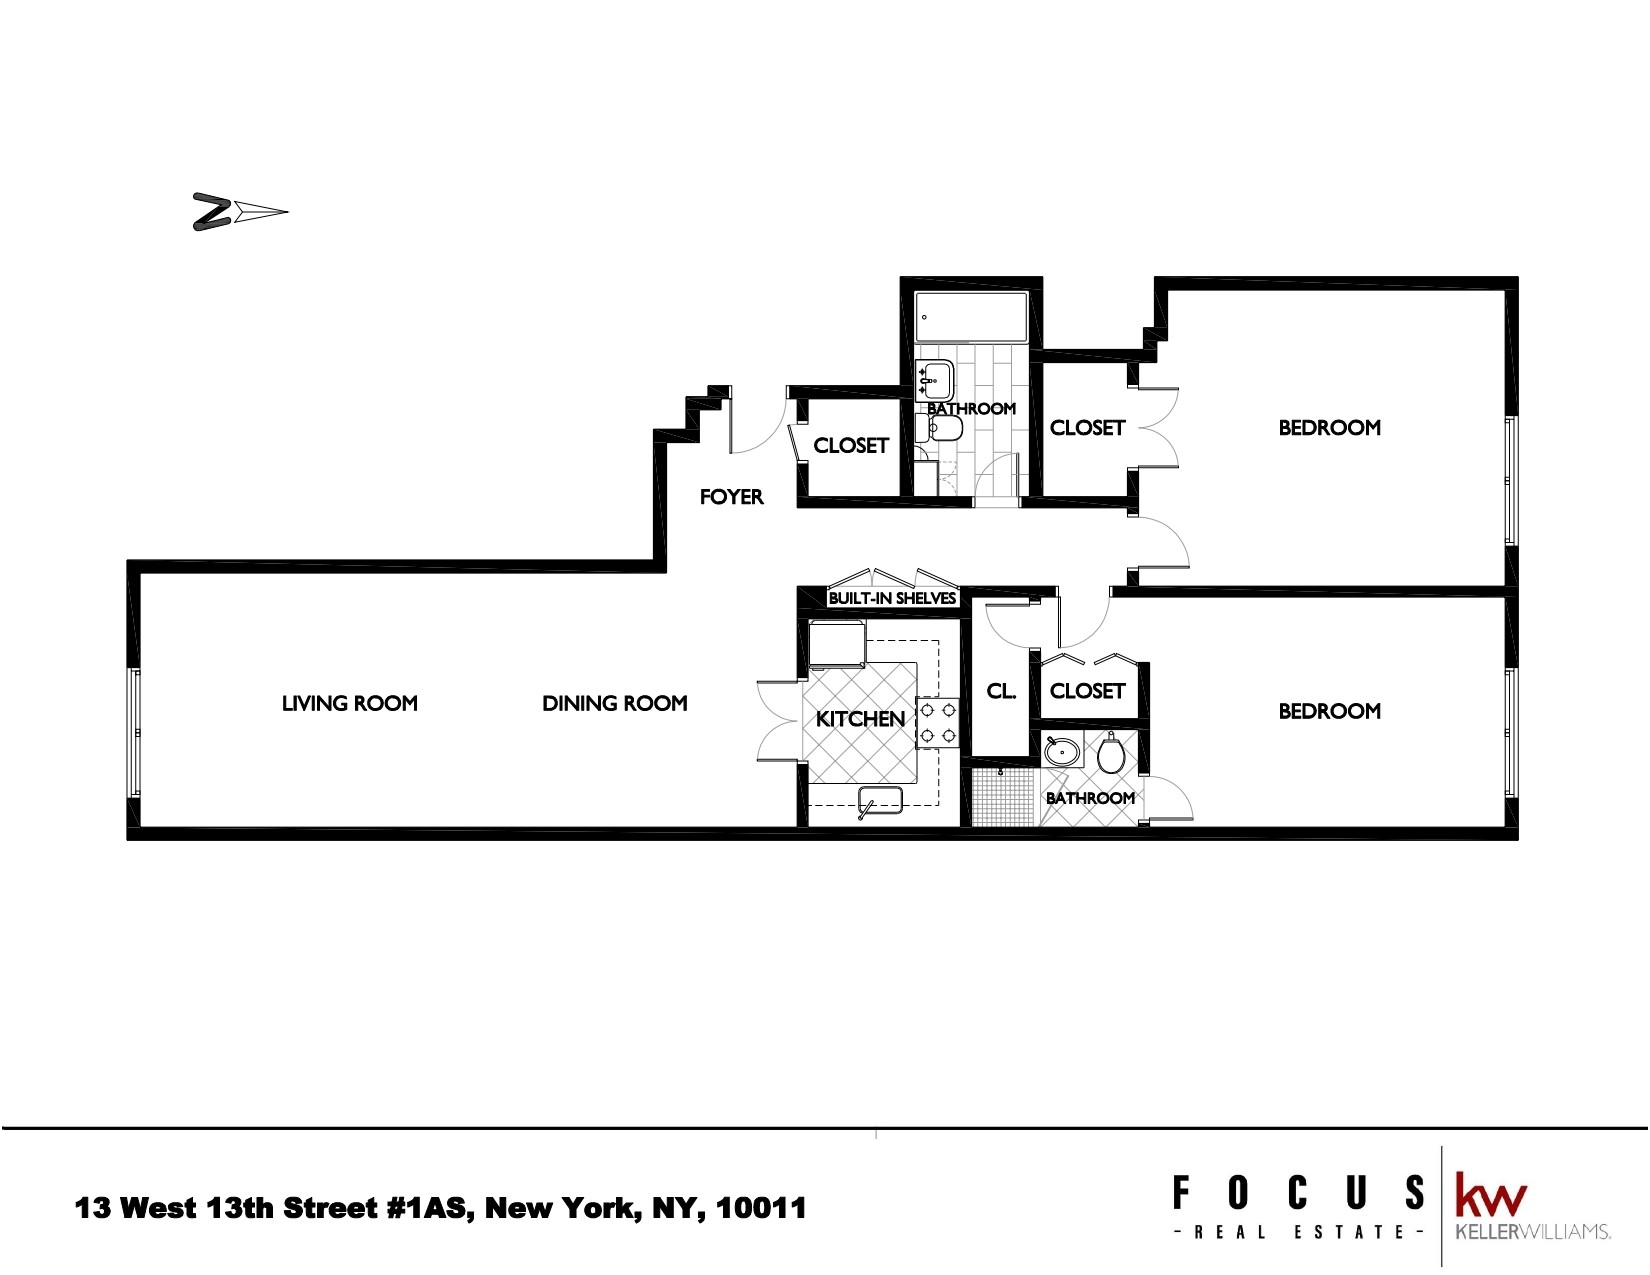 13 West 13th Street Greenwich Village New York NY 10011